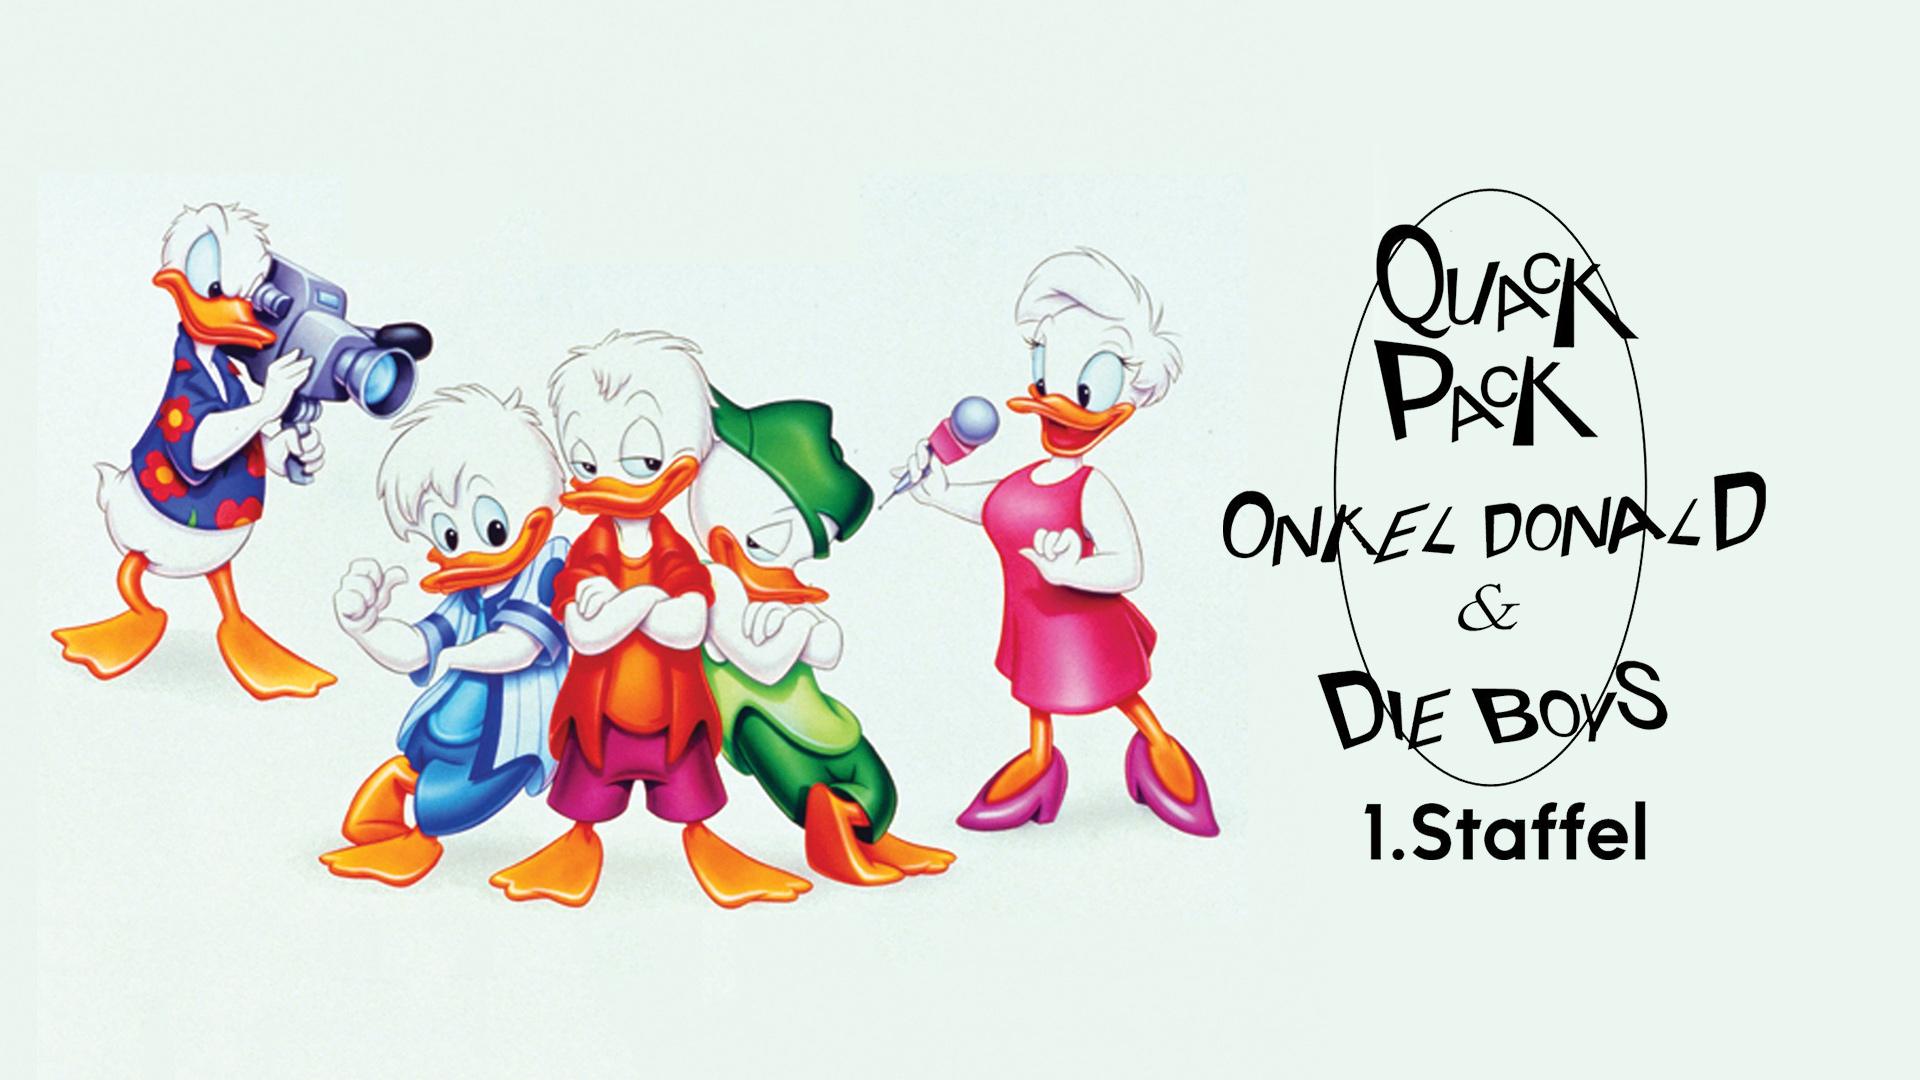 Quack Pack - Onkel Donald & die Boys - Staffel 1 Teil 1